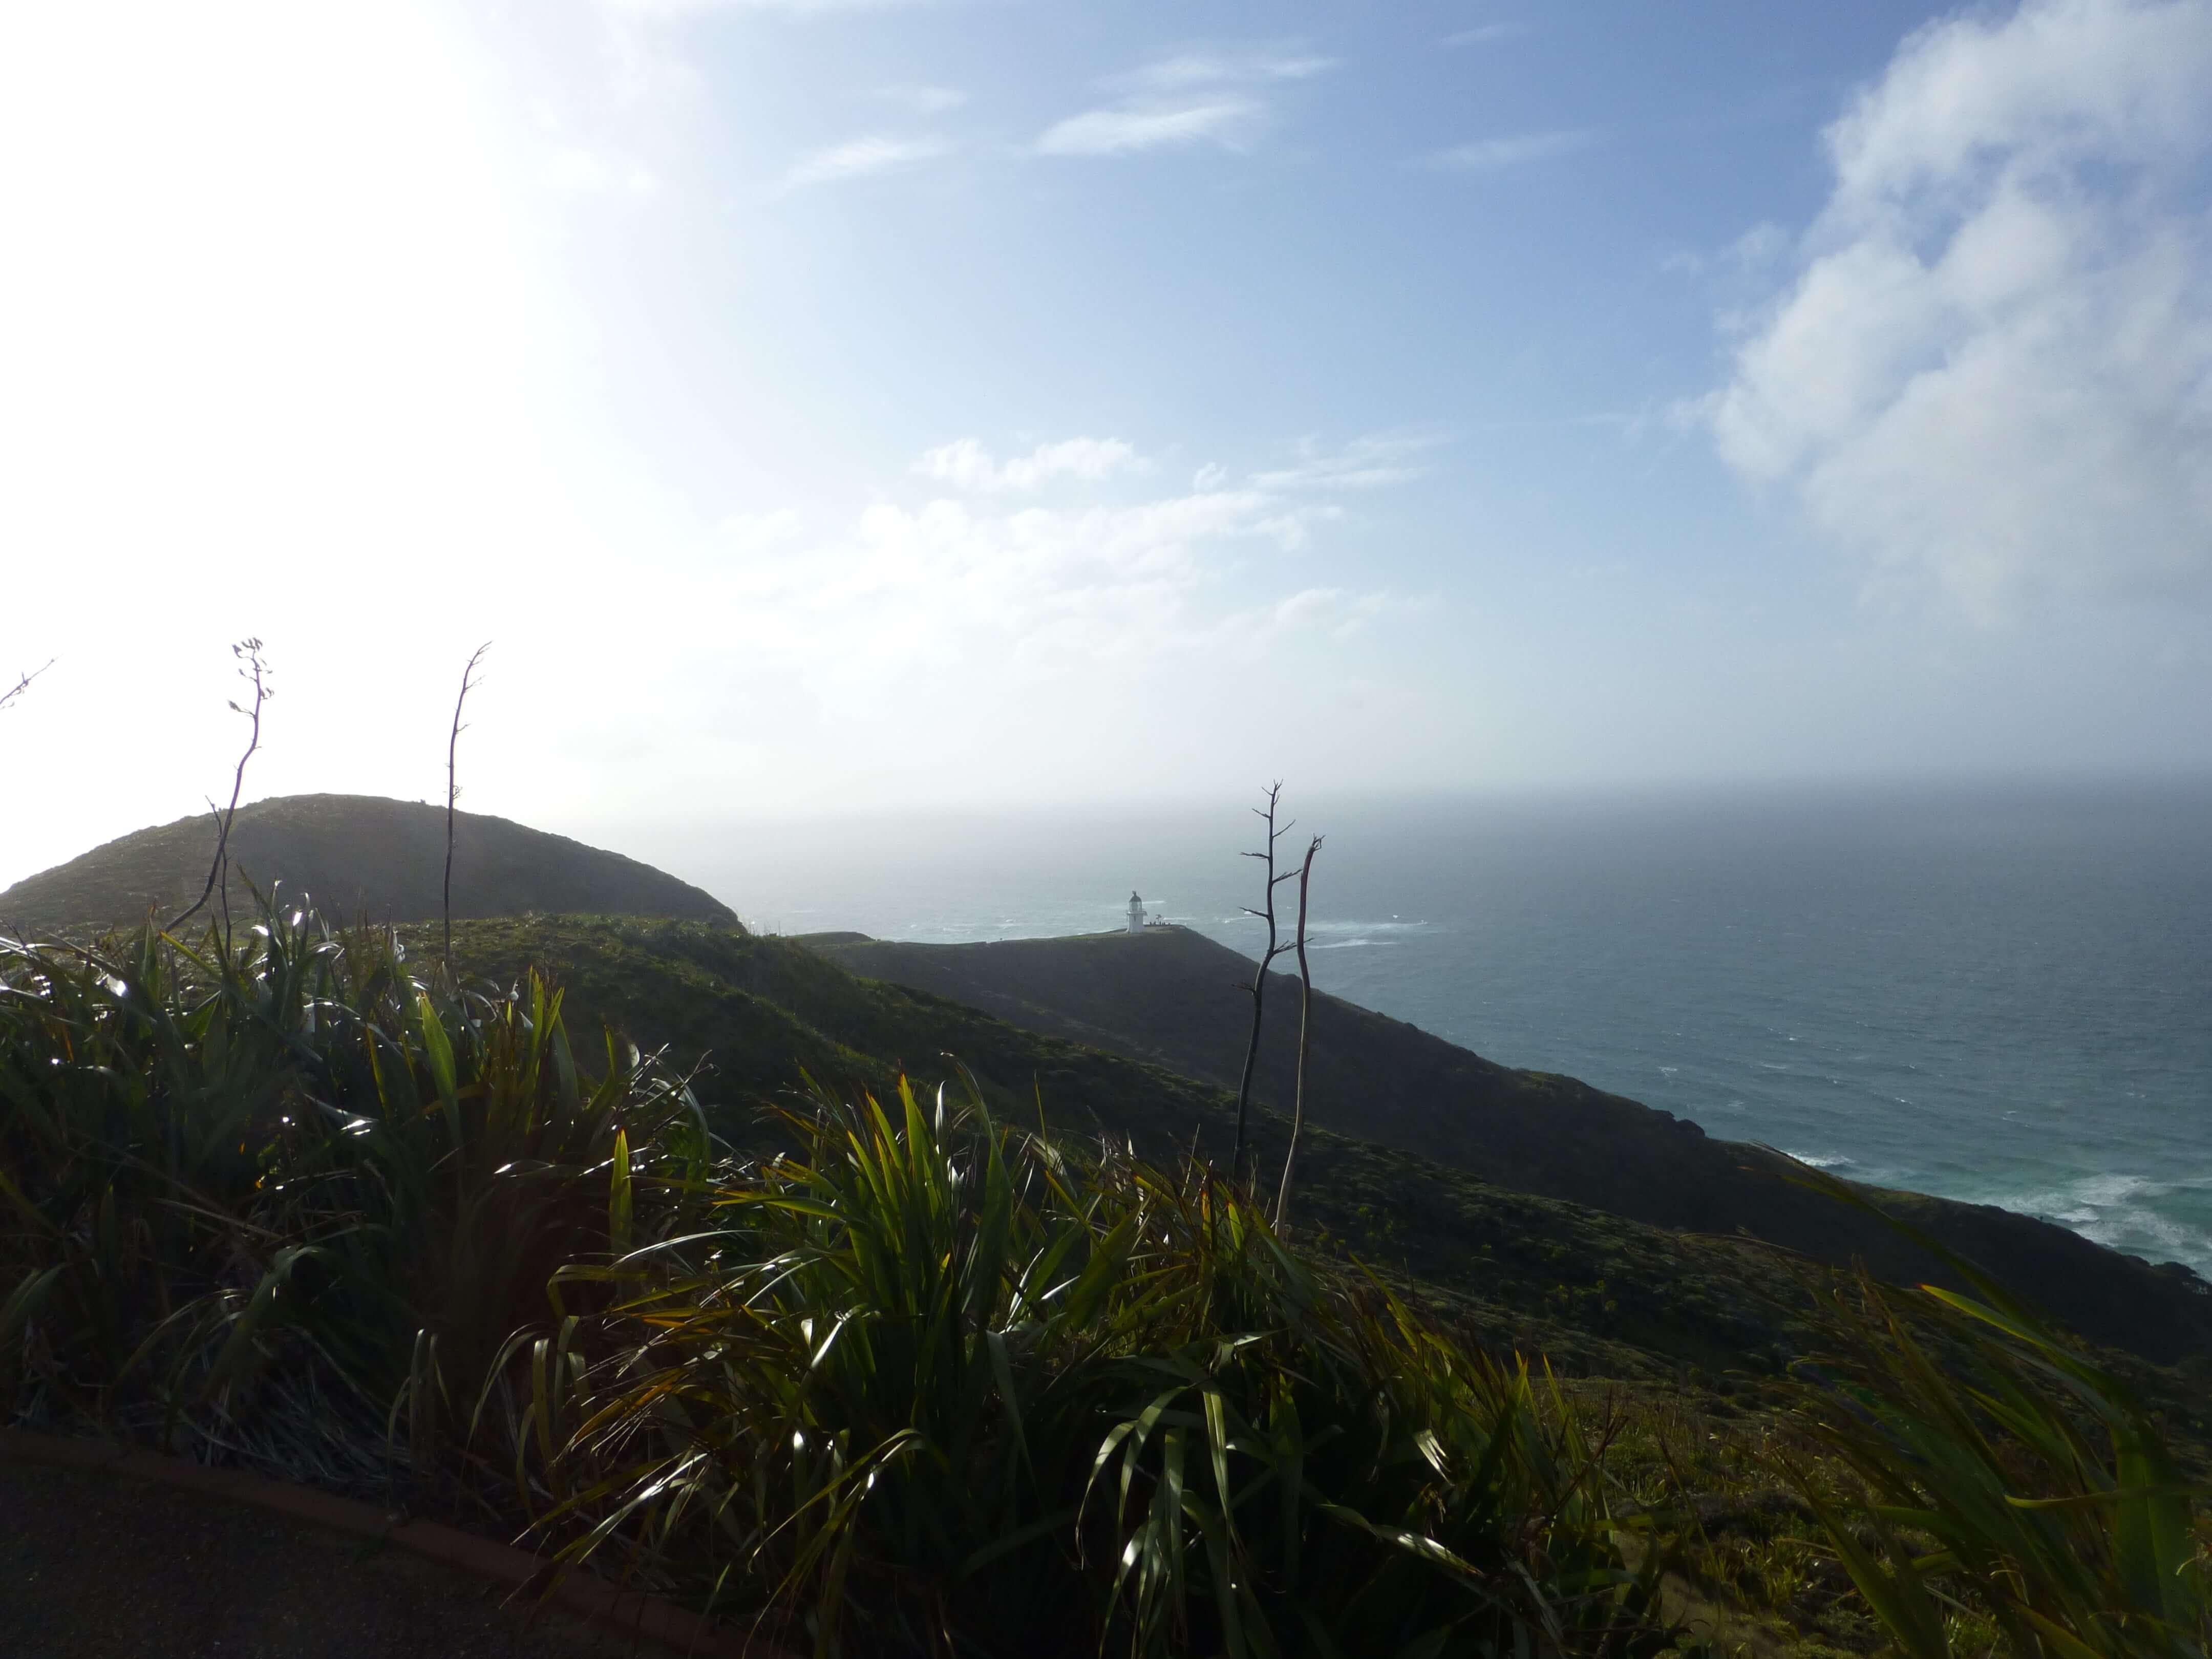 Leuchtturm am Cape Reinga 4